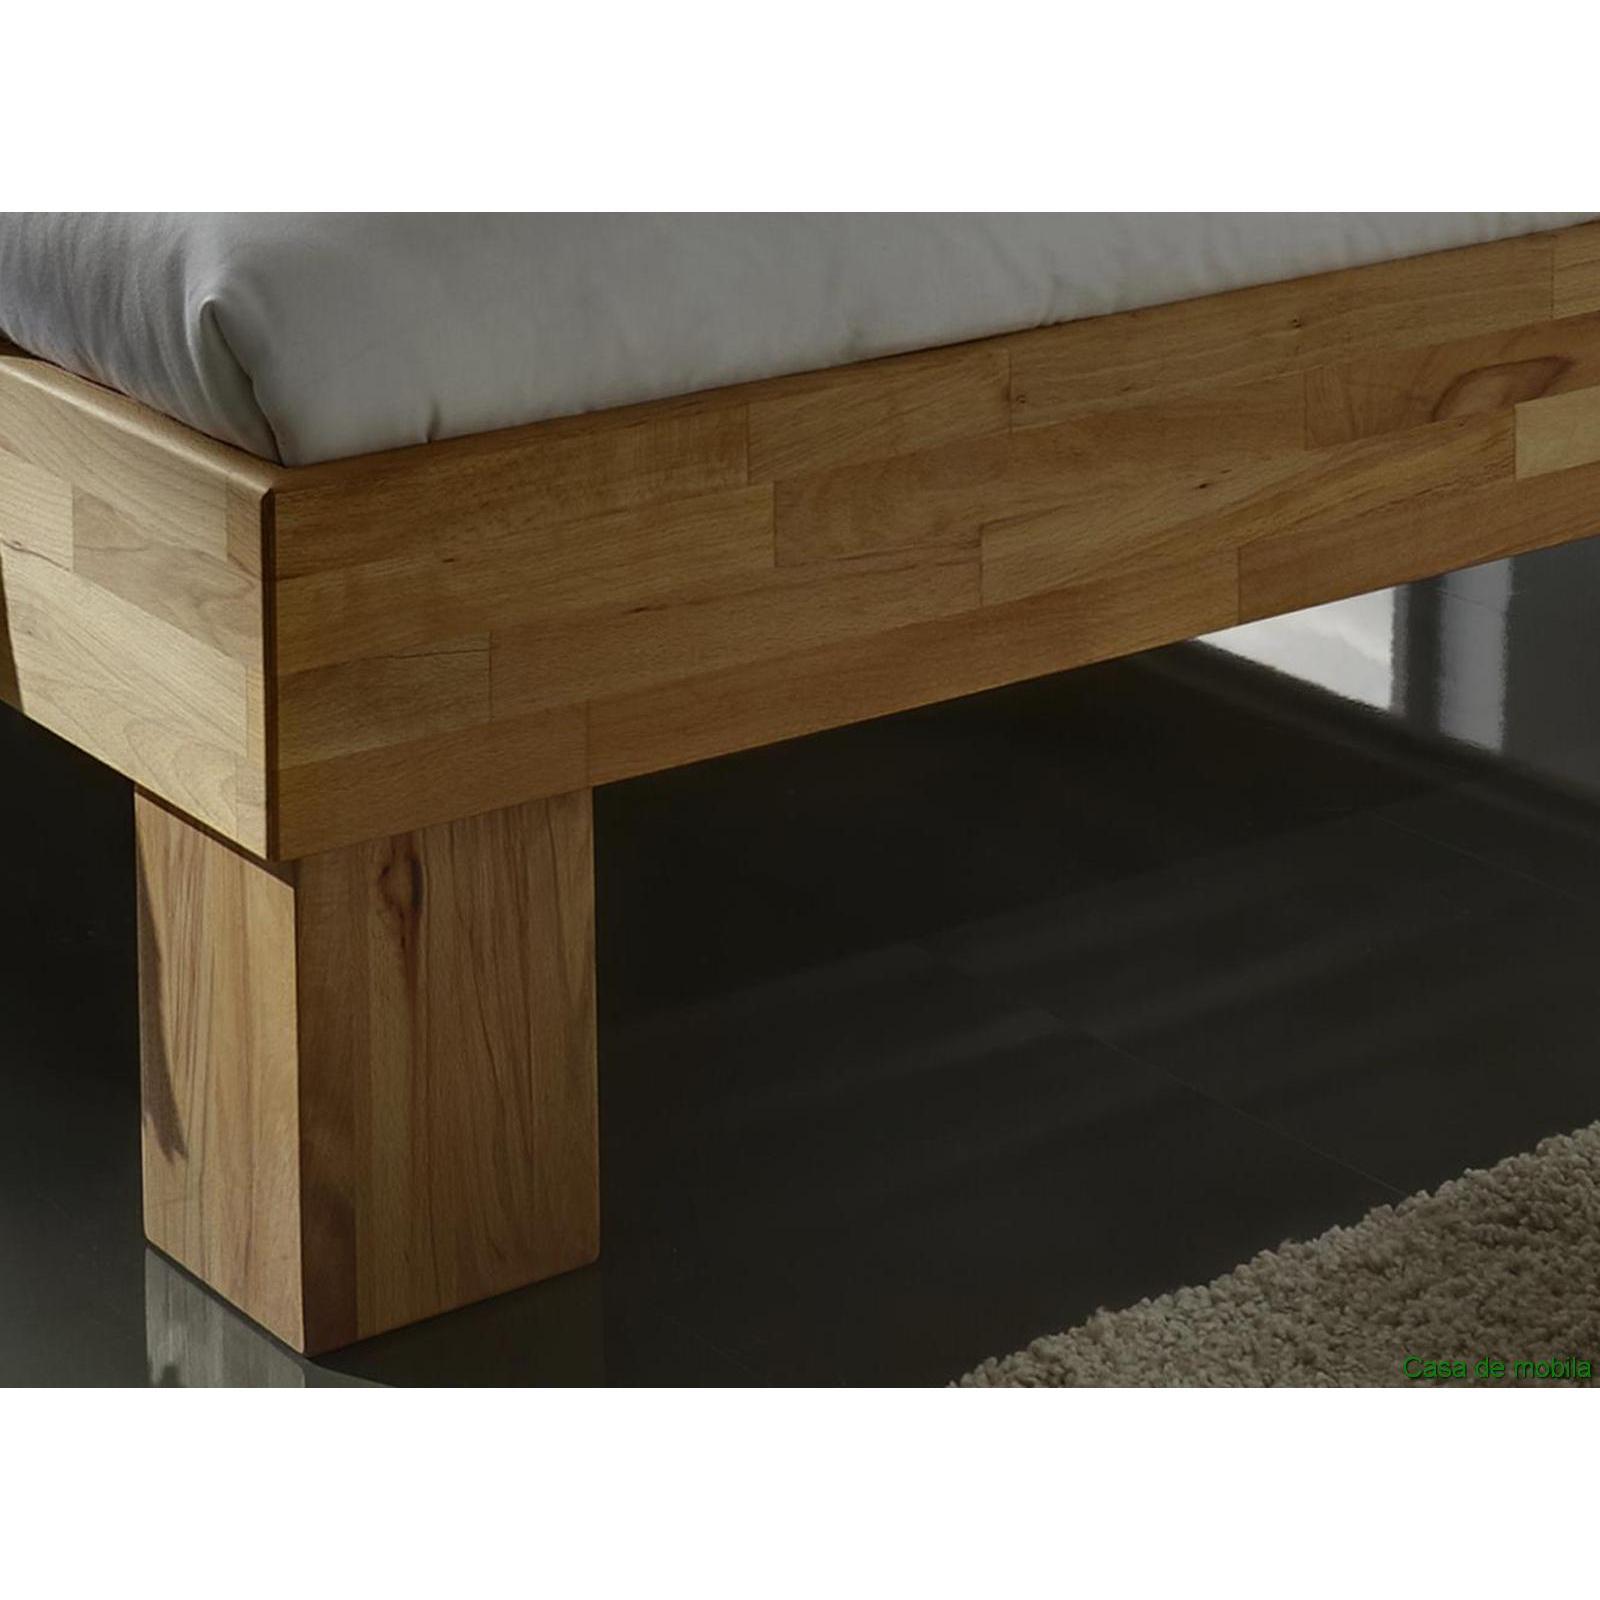 einzelbett bett rahmen jugendbett bettgestell 90x200 kernbuche massiv holz ge lt ebay. Black Bedroom Furniture Sets. Home Design Ideas